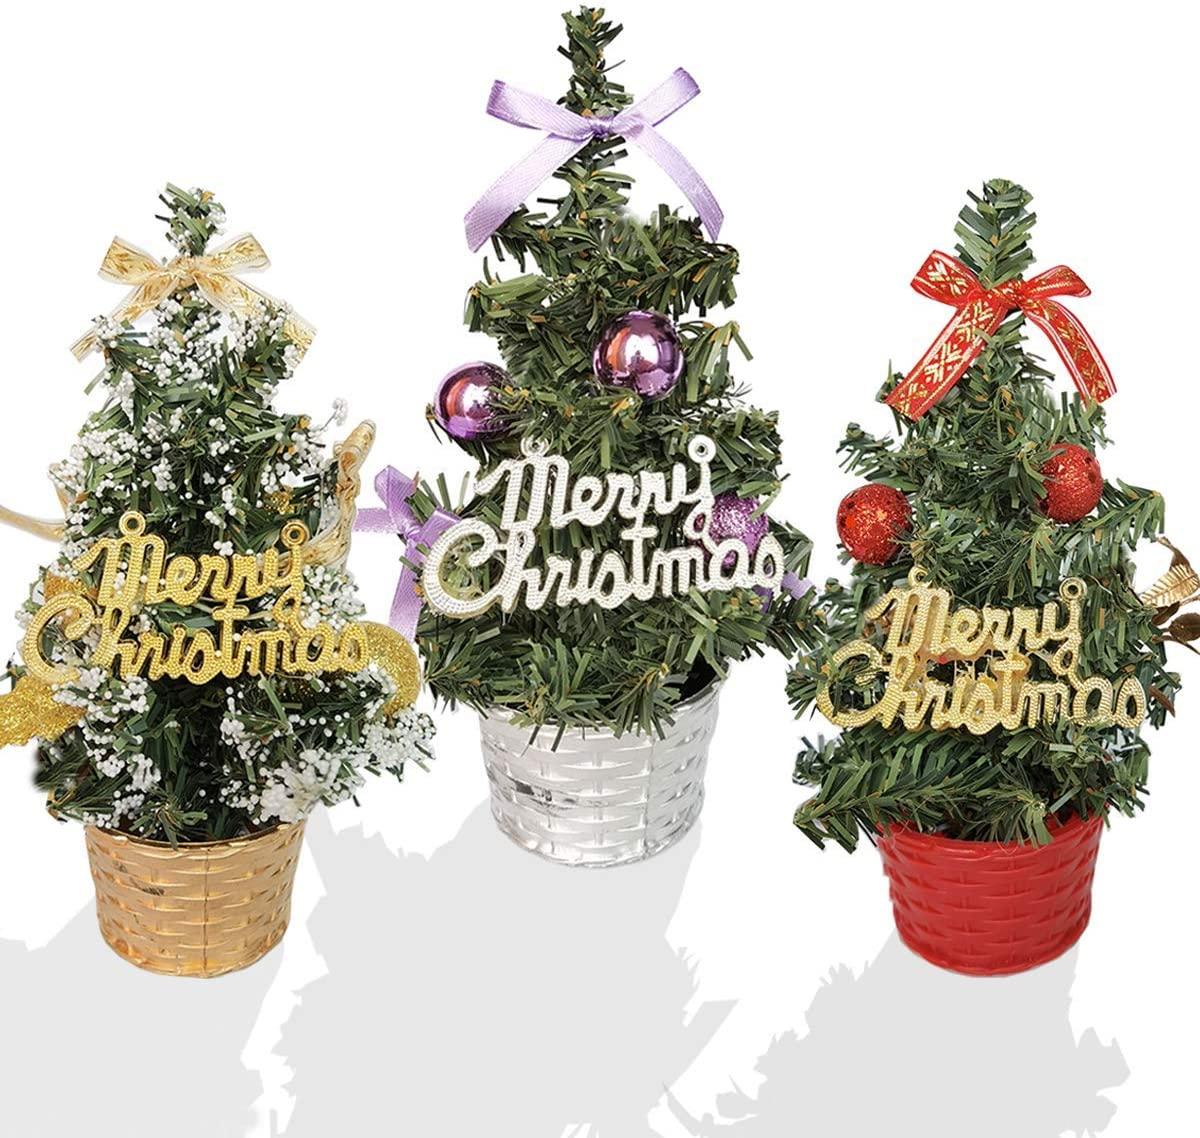 Feiyuan Small Christmas Tree Mini Christmas Trees Small Christmas Tree Xmas Decoration Xmas Ornament for Table, Desk Tops, Home Decor, Office (3pcs/20cm)